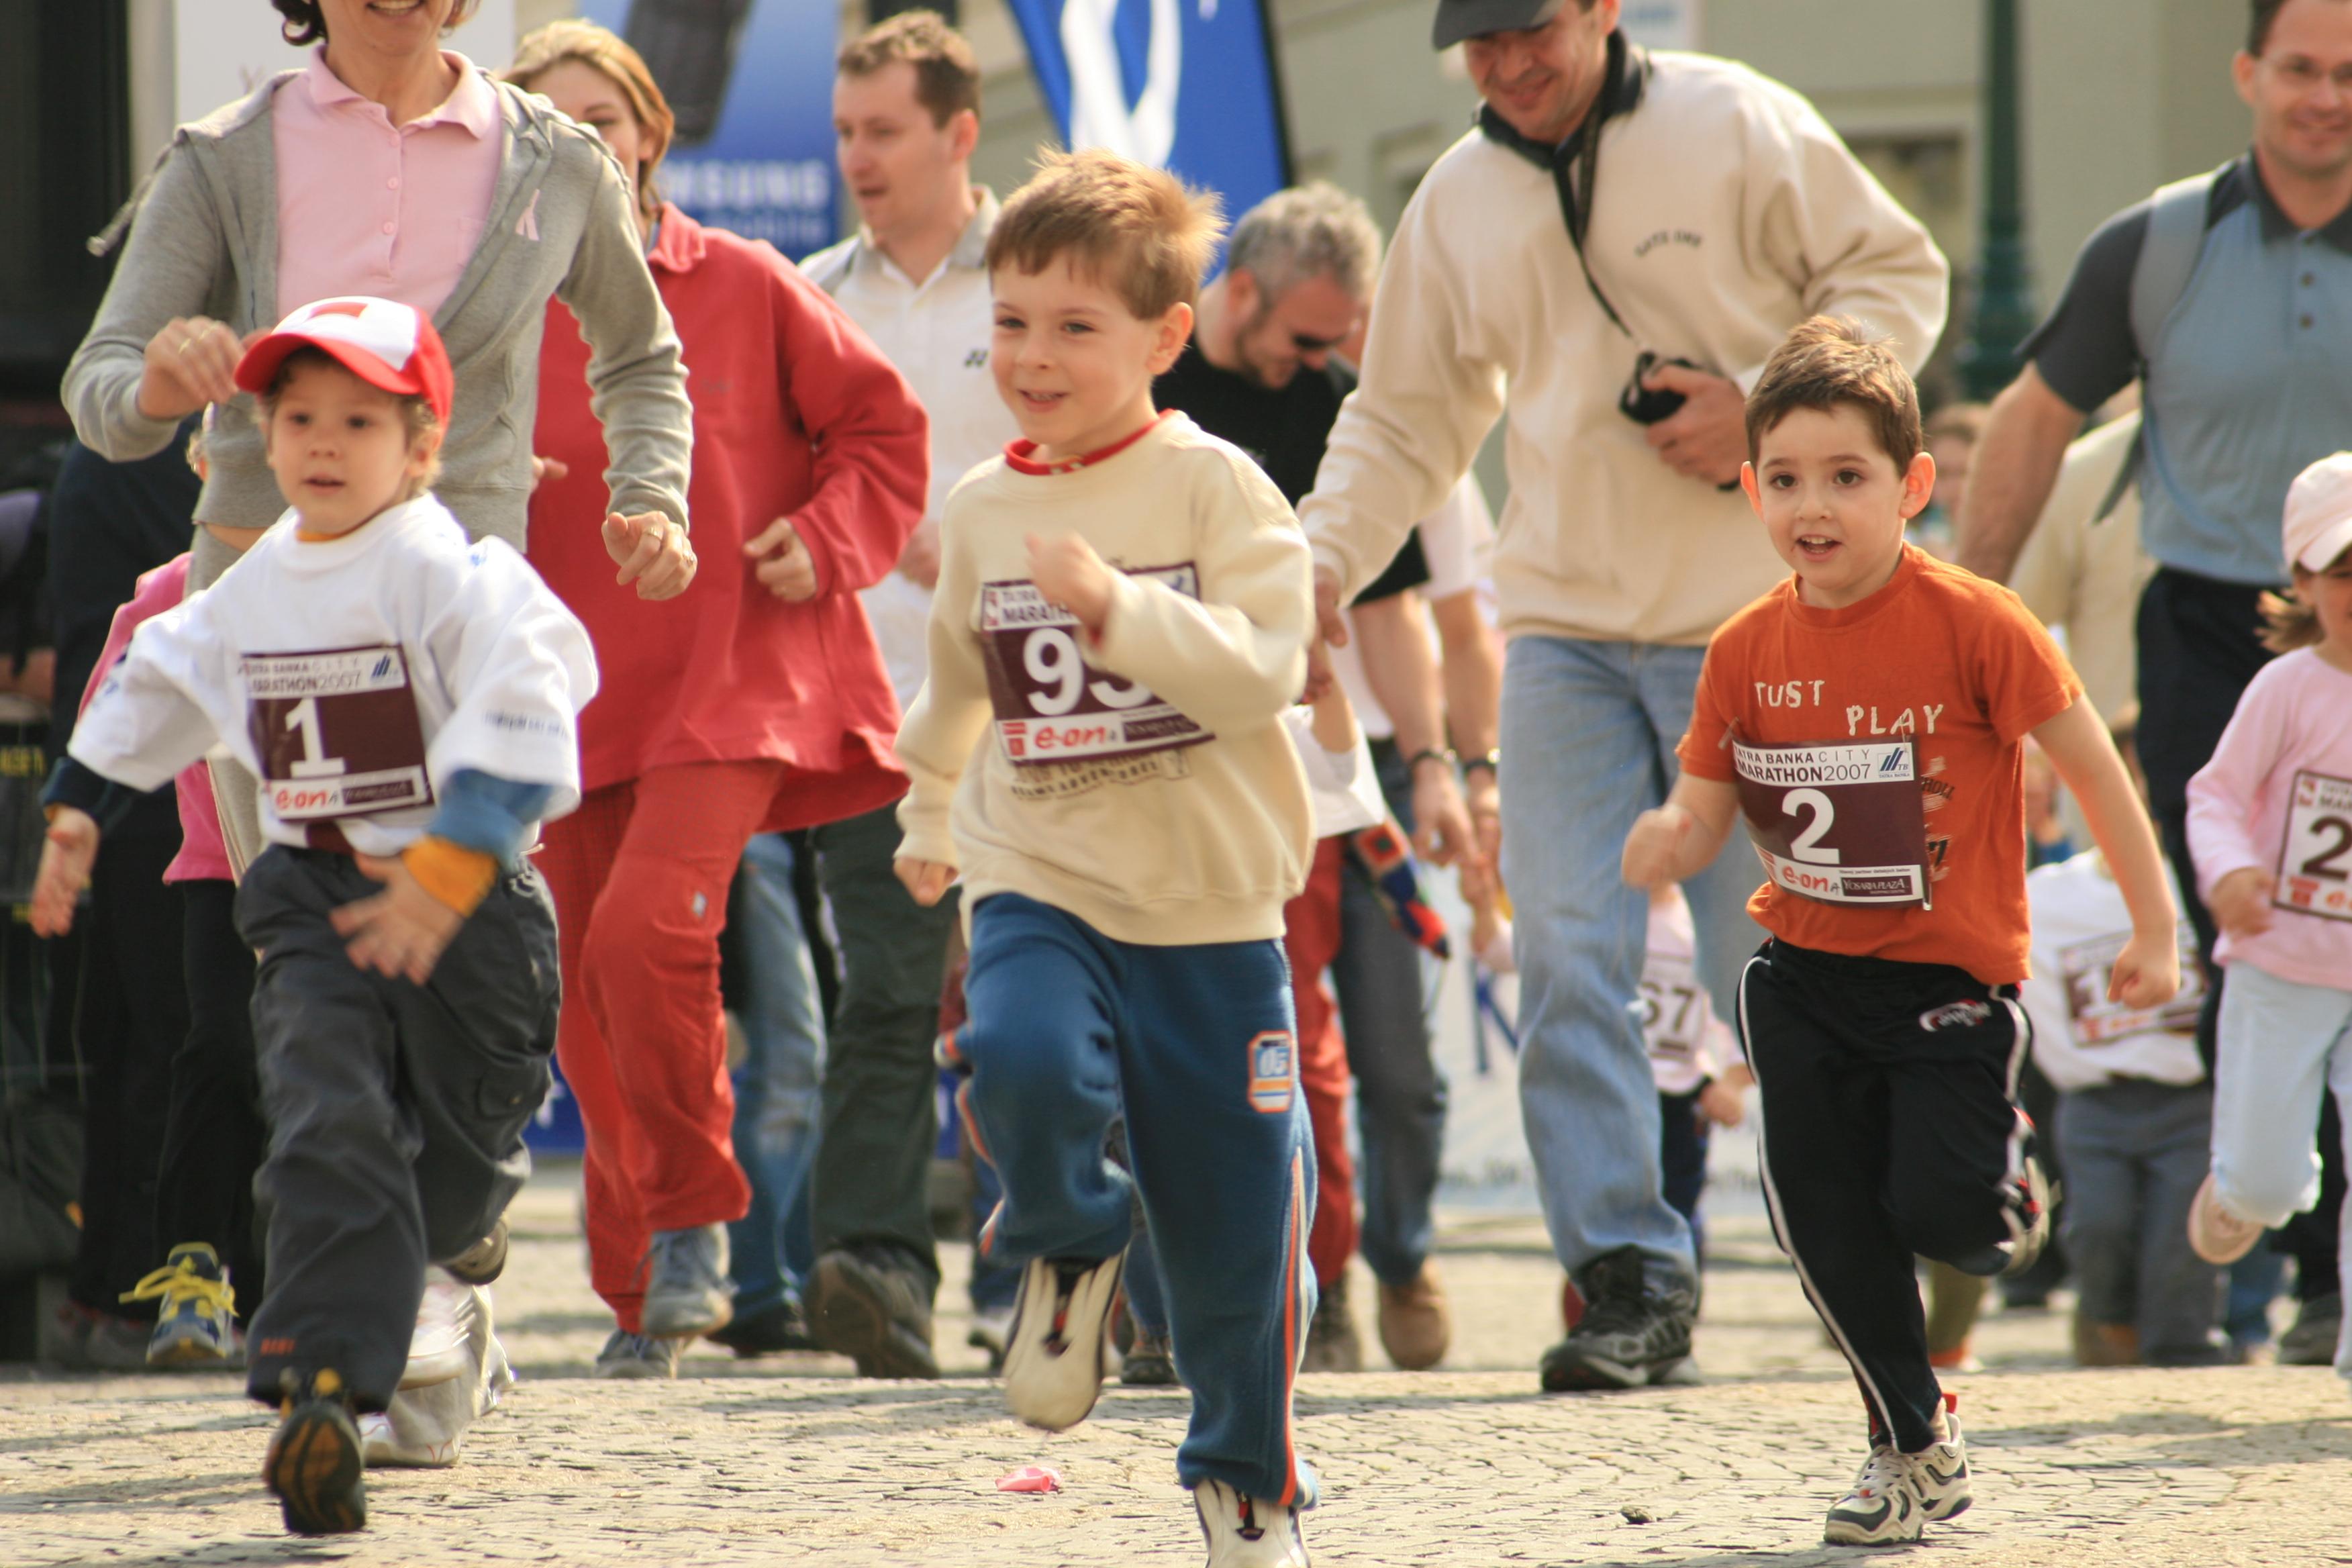 Srdce Slovenska opäť rozbúcha maratón - Katalóg firiem  82242e2a3f6